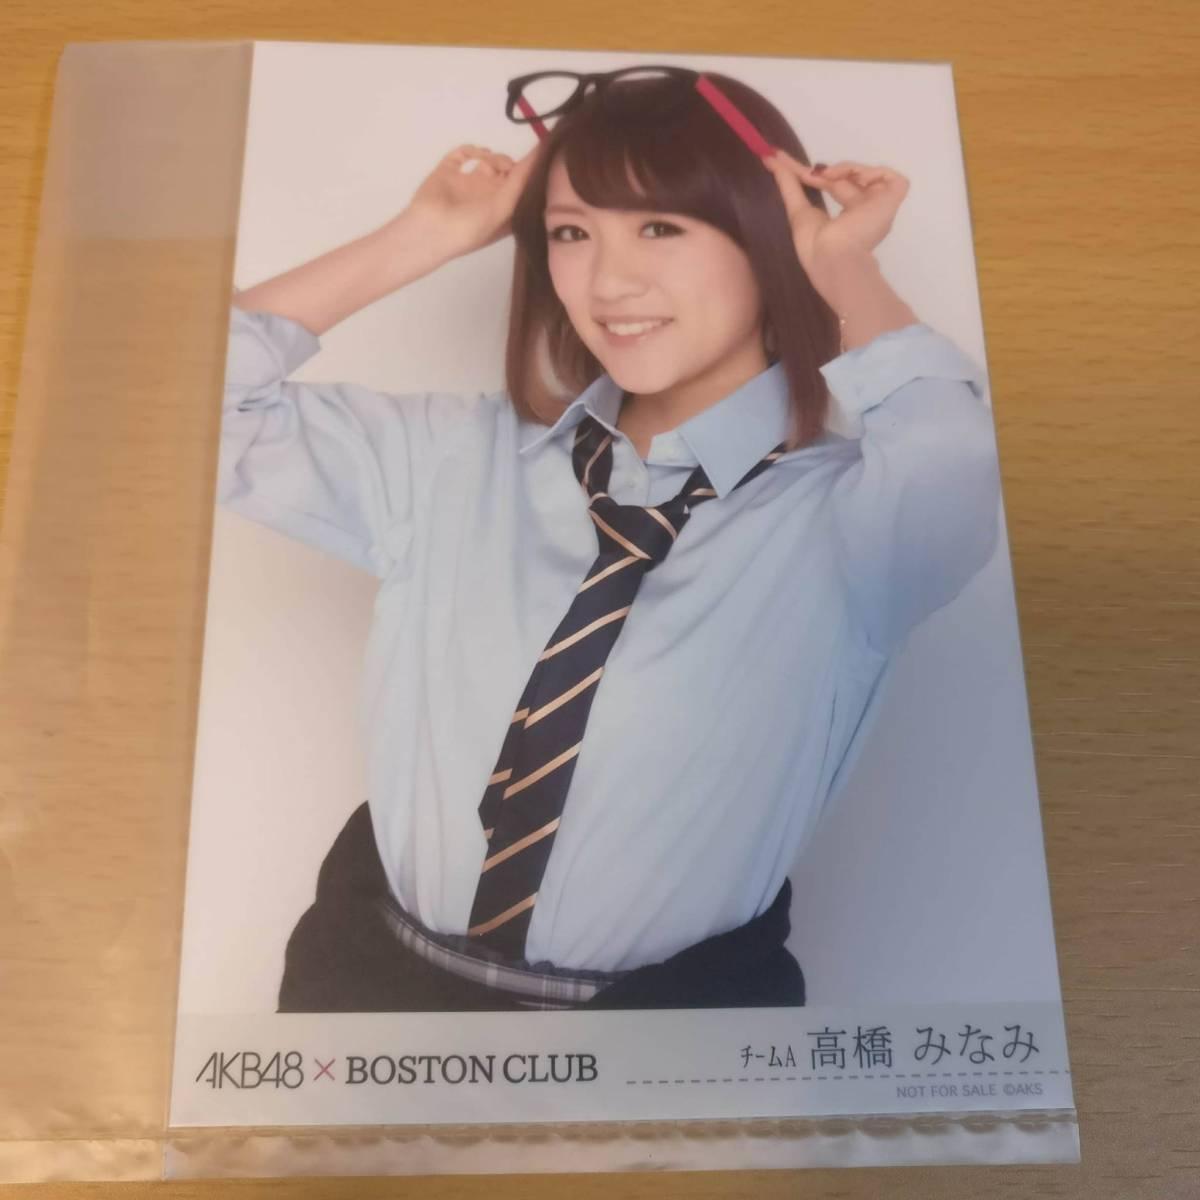 AKB48 高橋みなみ AKB48×BOSTON CLUB 公式生写真 ボストンクラブ メガネ